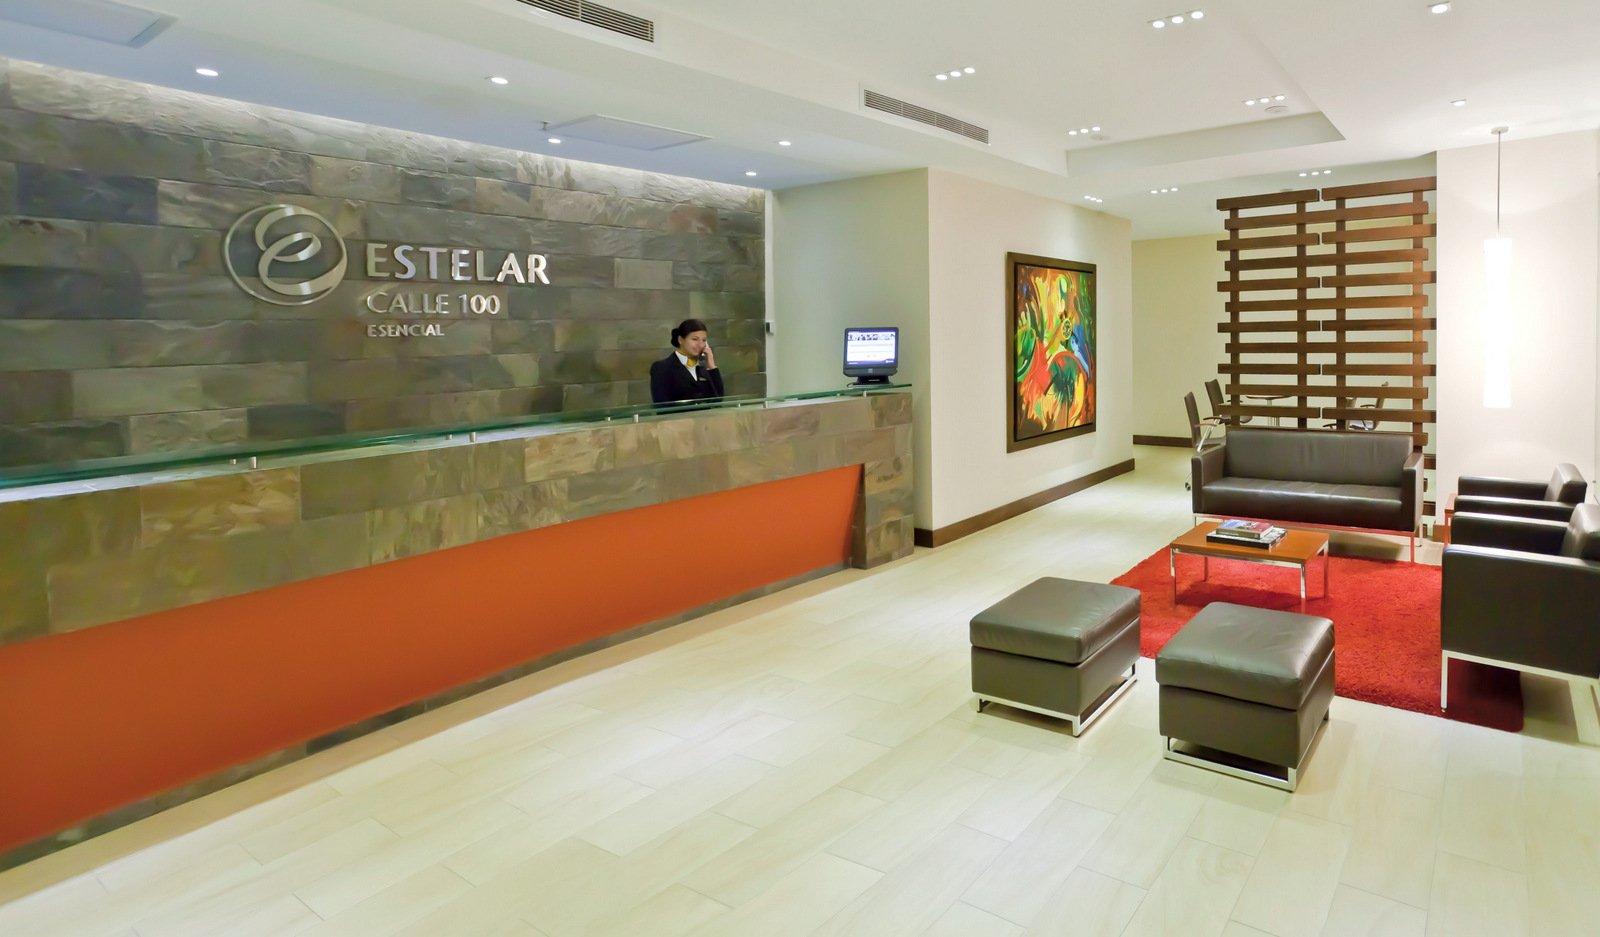 Fotos hotel estelar calle 100 en bogot web oficial for Diseno de lobby de hoteles